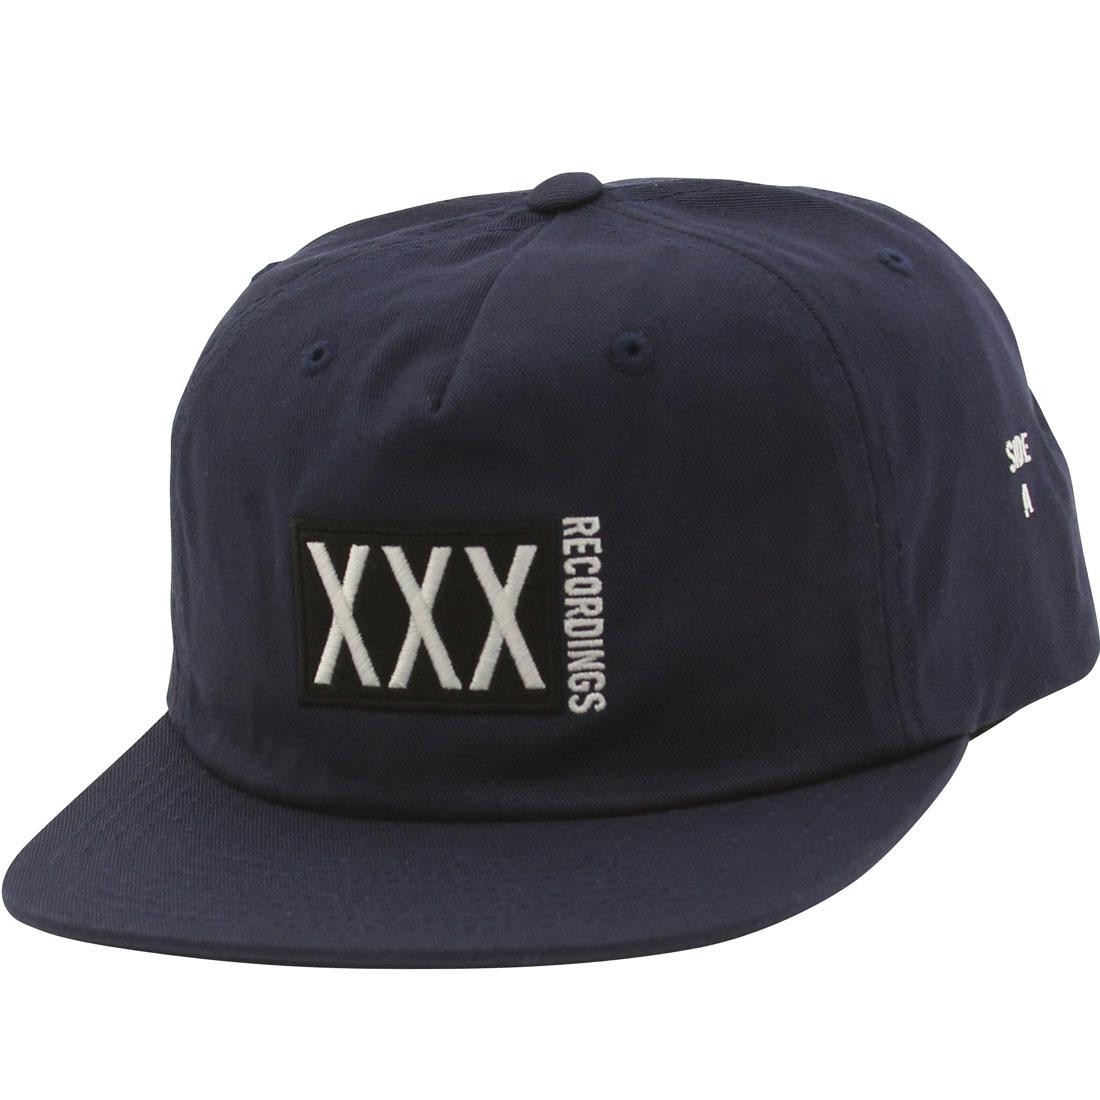 10 Deep Triple X Records Snapback Cap (navy)